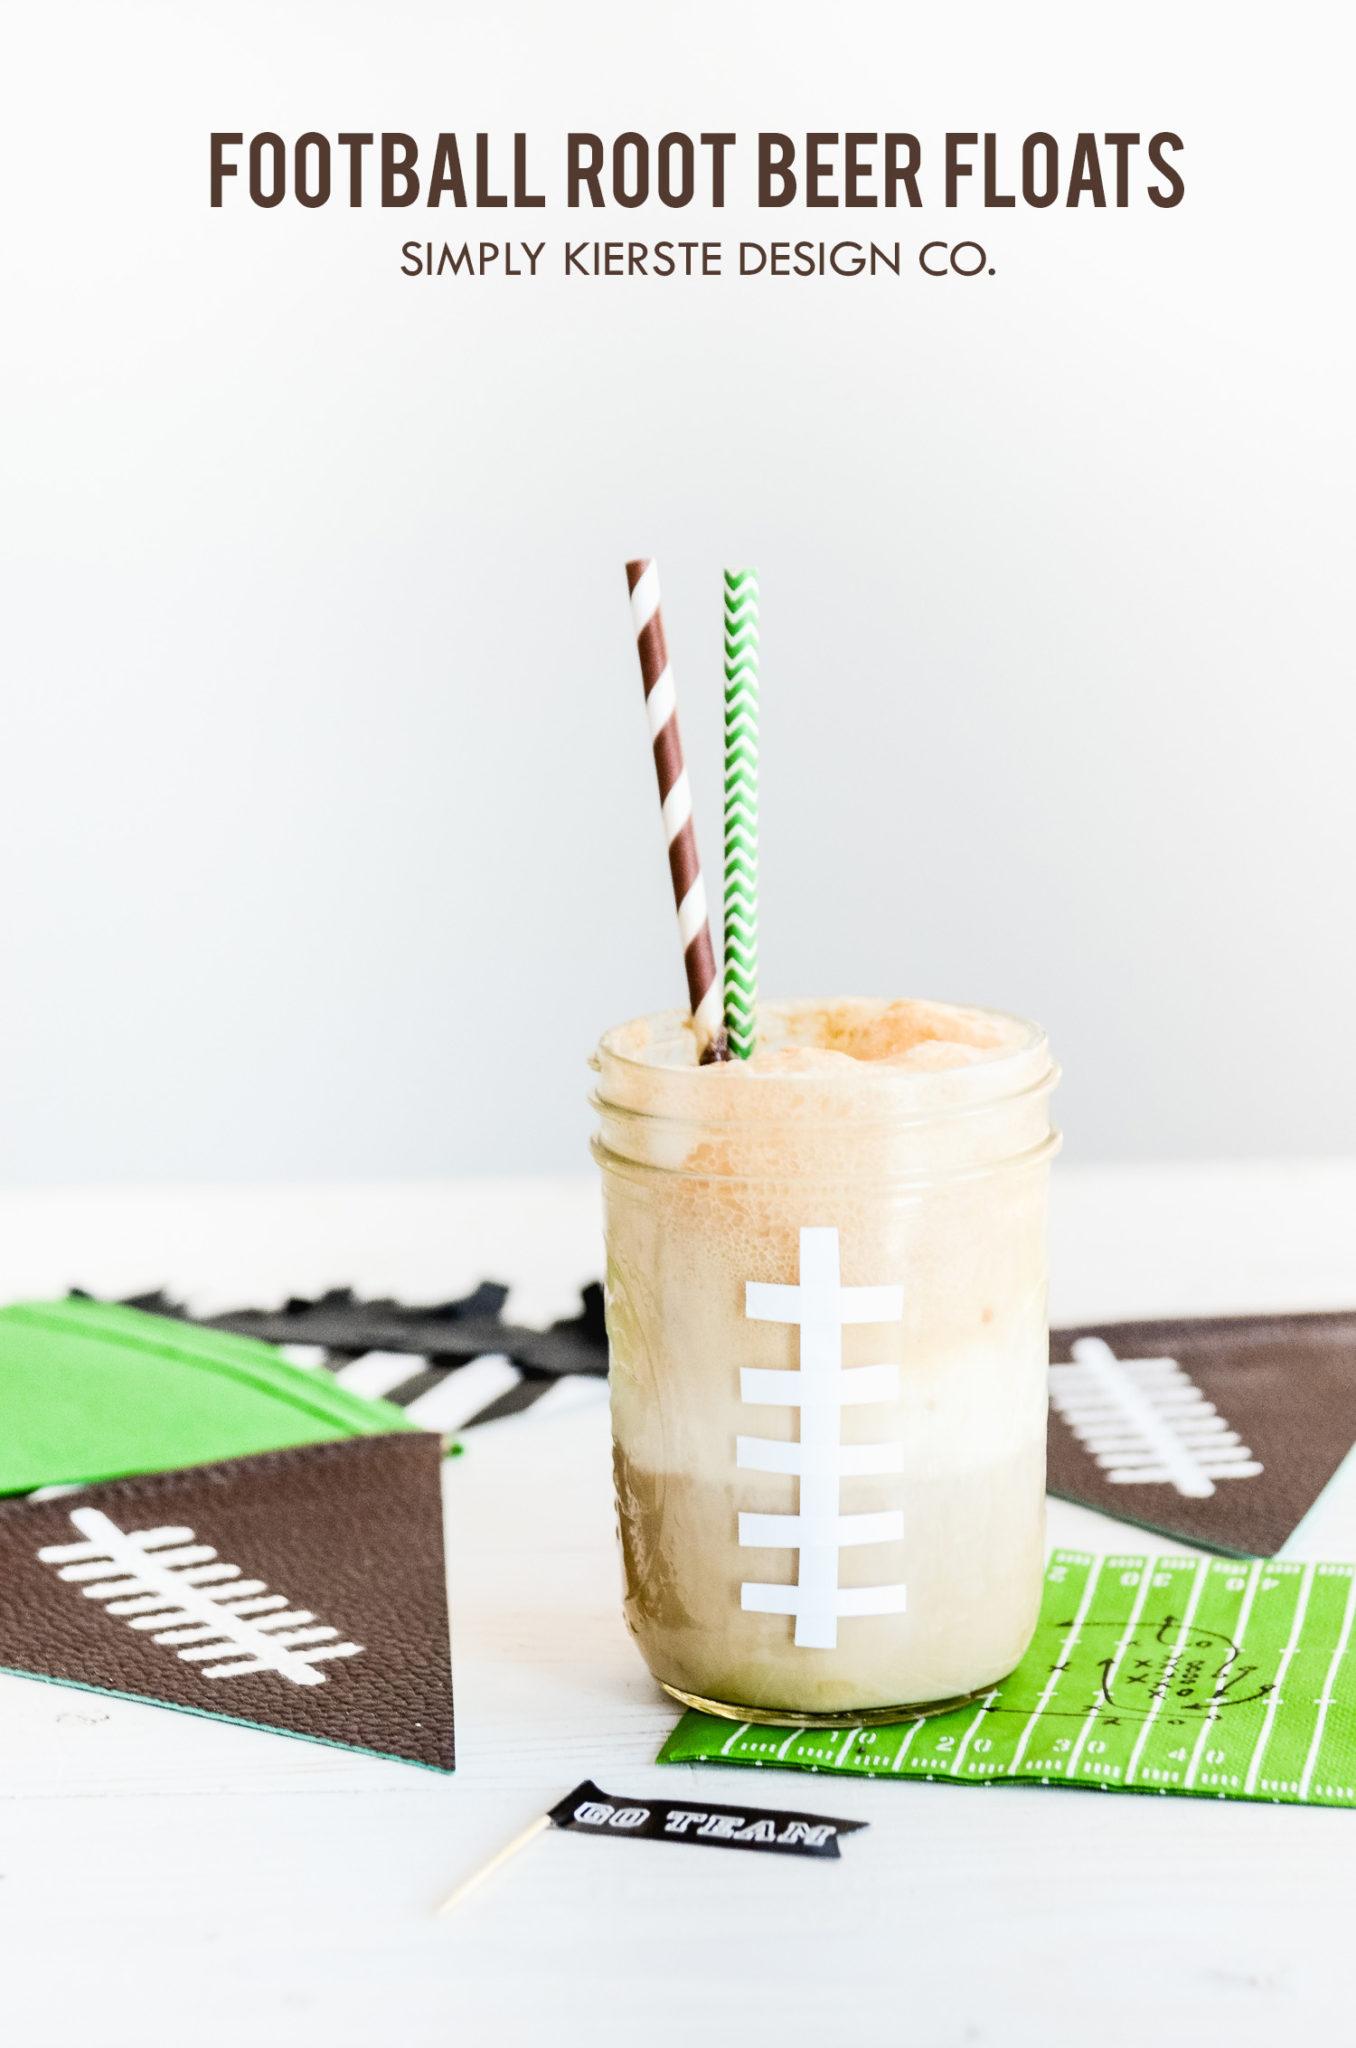 Football Root Beer Floats | Game Day Treats | oldsaltfarm.com #footballtreats #gamedayfood #masonjarideas #gamedayrecipes